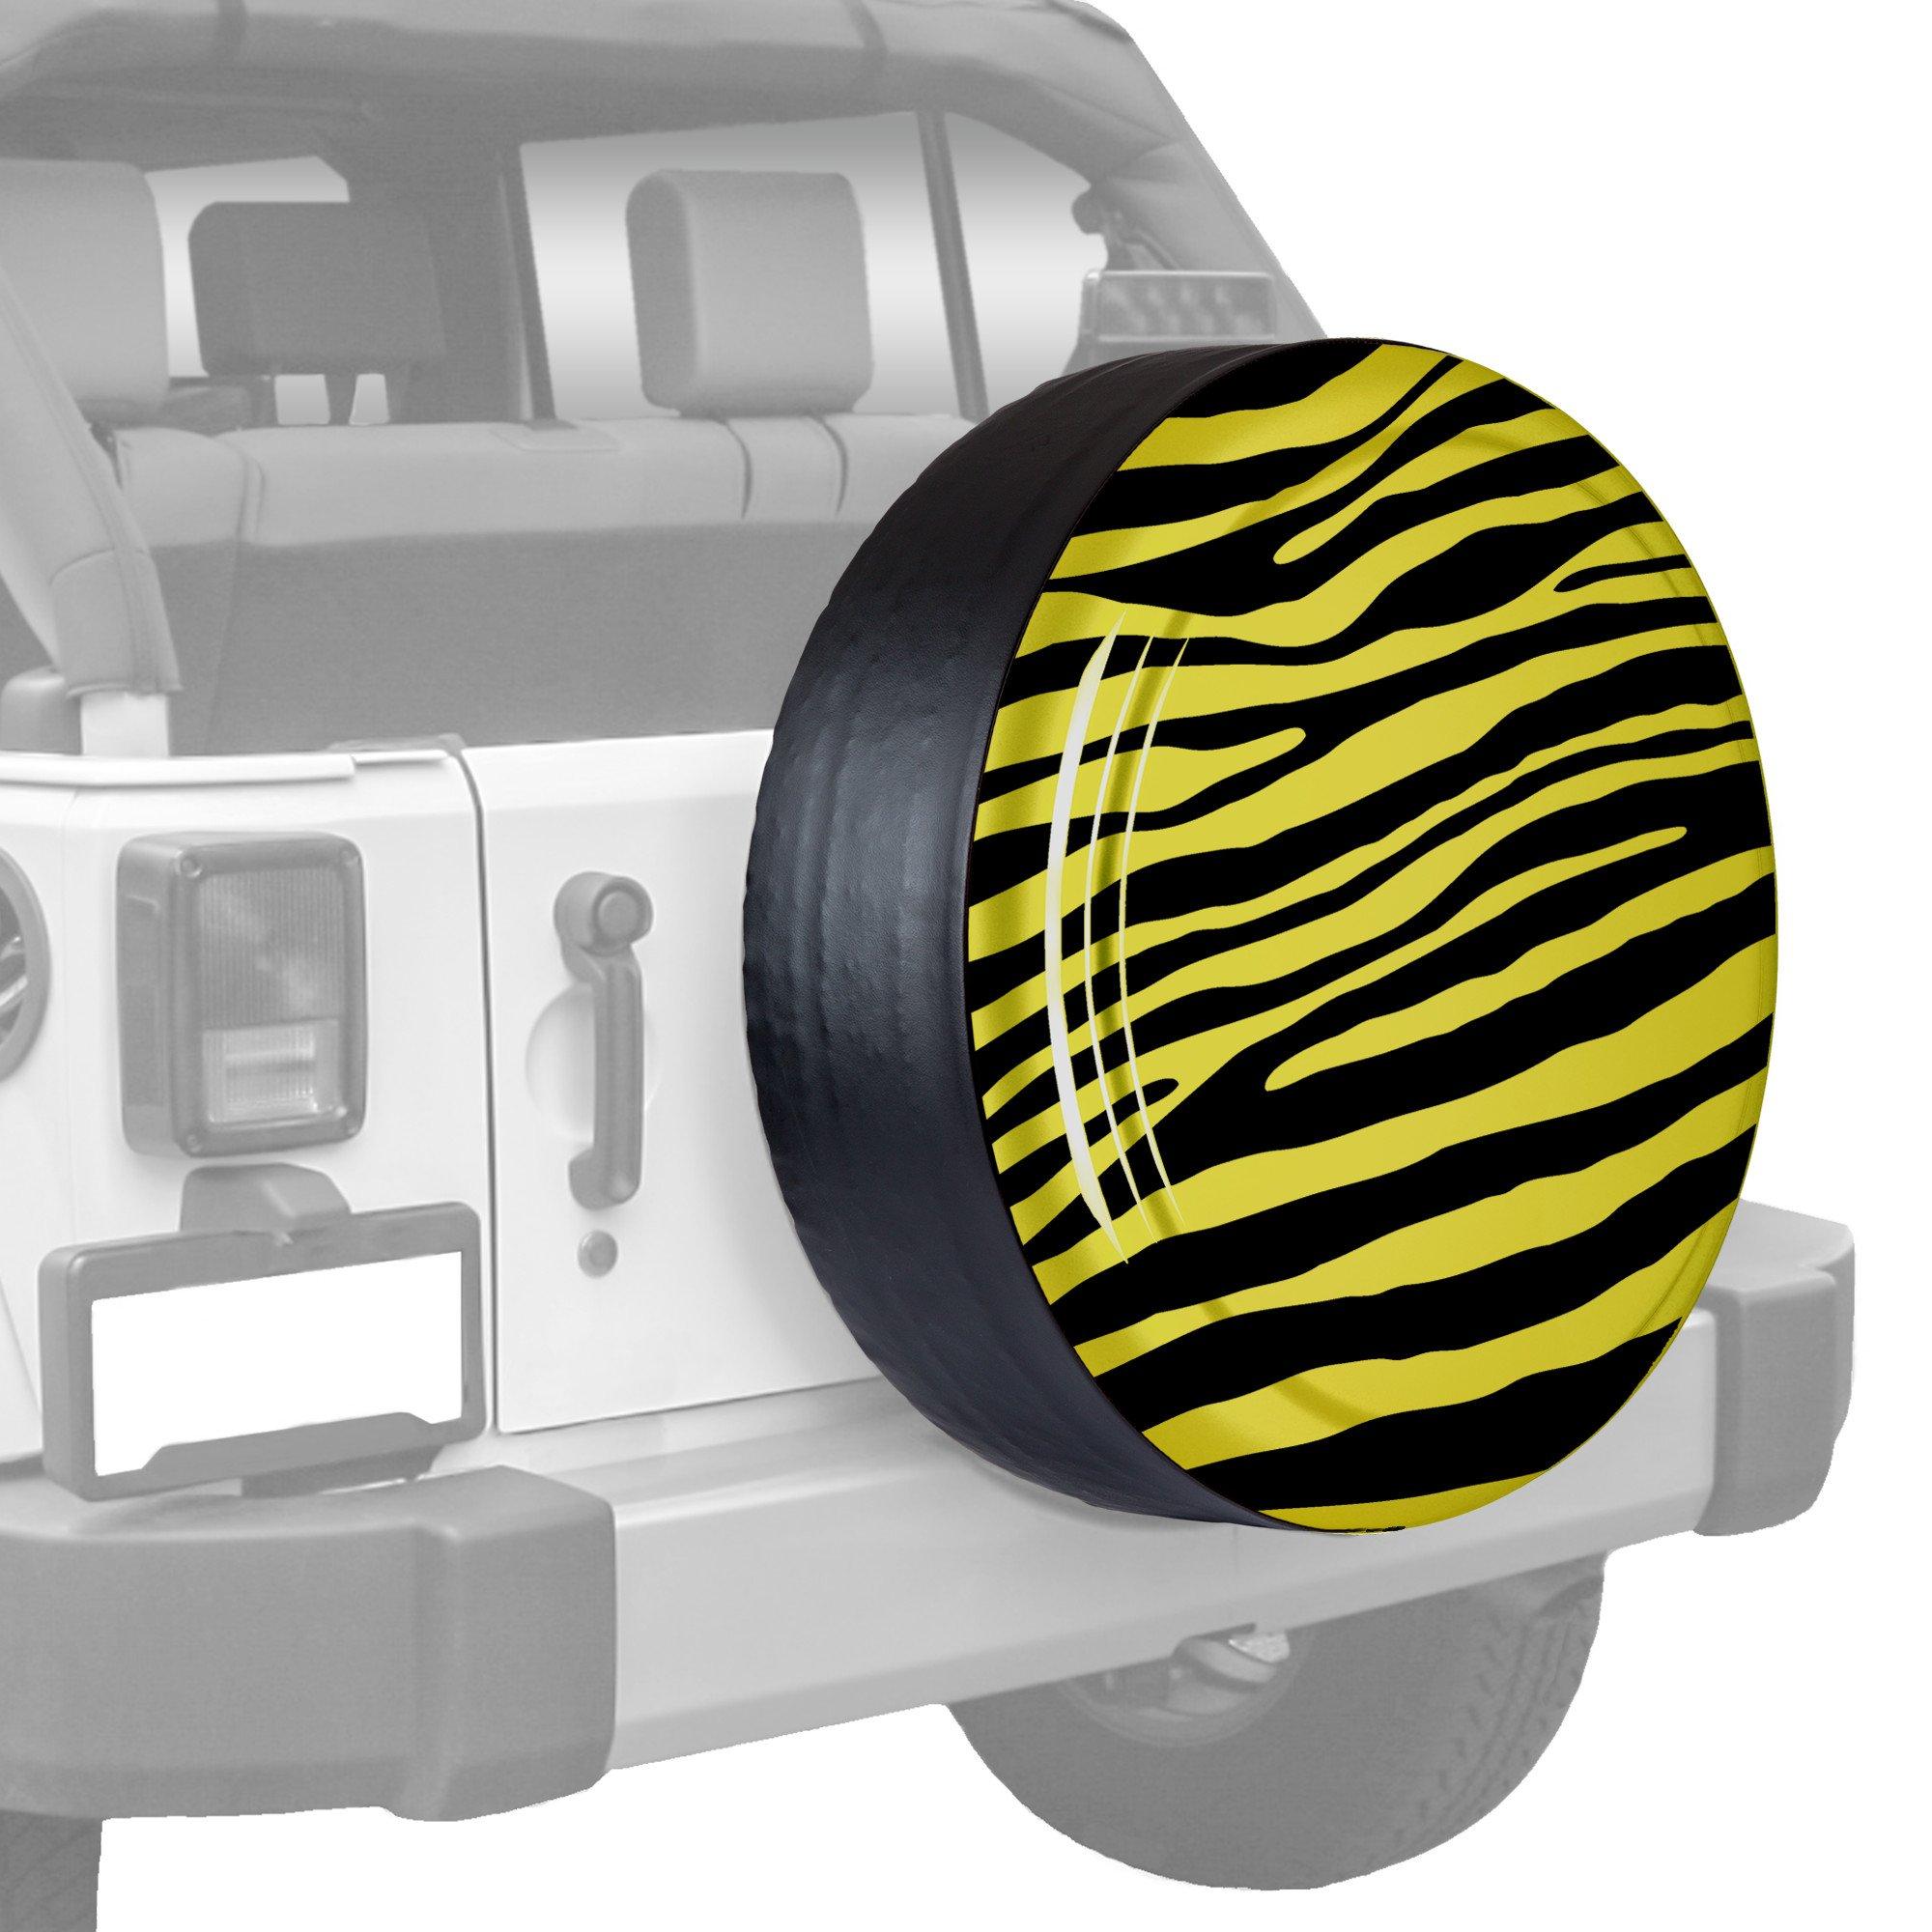 30'' Zebra Print - Color Matched Rigid Tire Cover (Plastic Face & Vinyl Band) - Jeep Wrangler (JK) - Acid Yellow